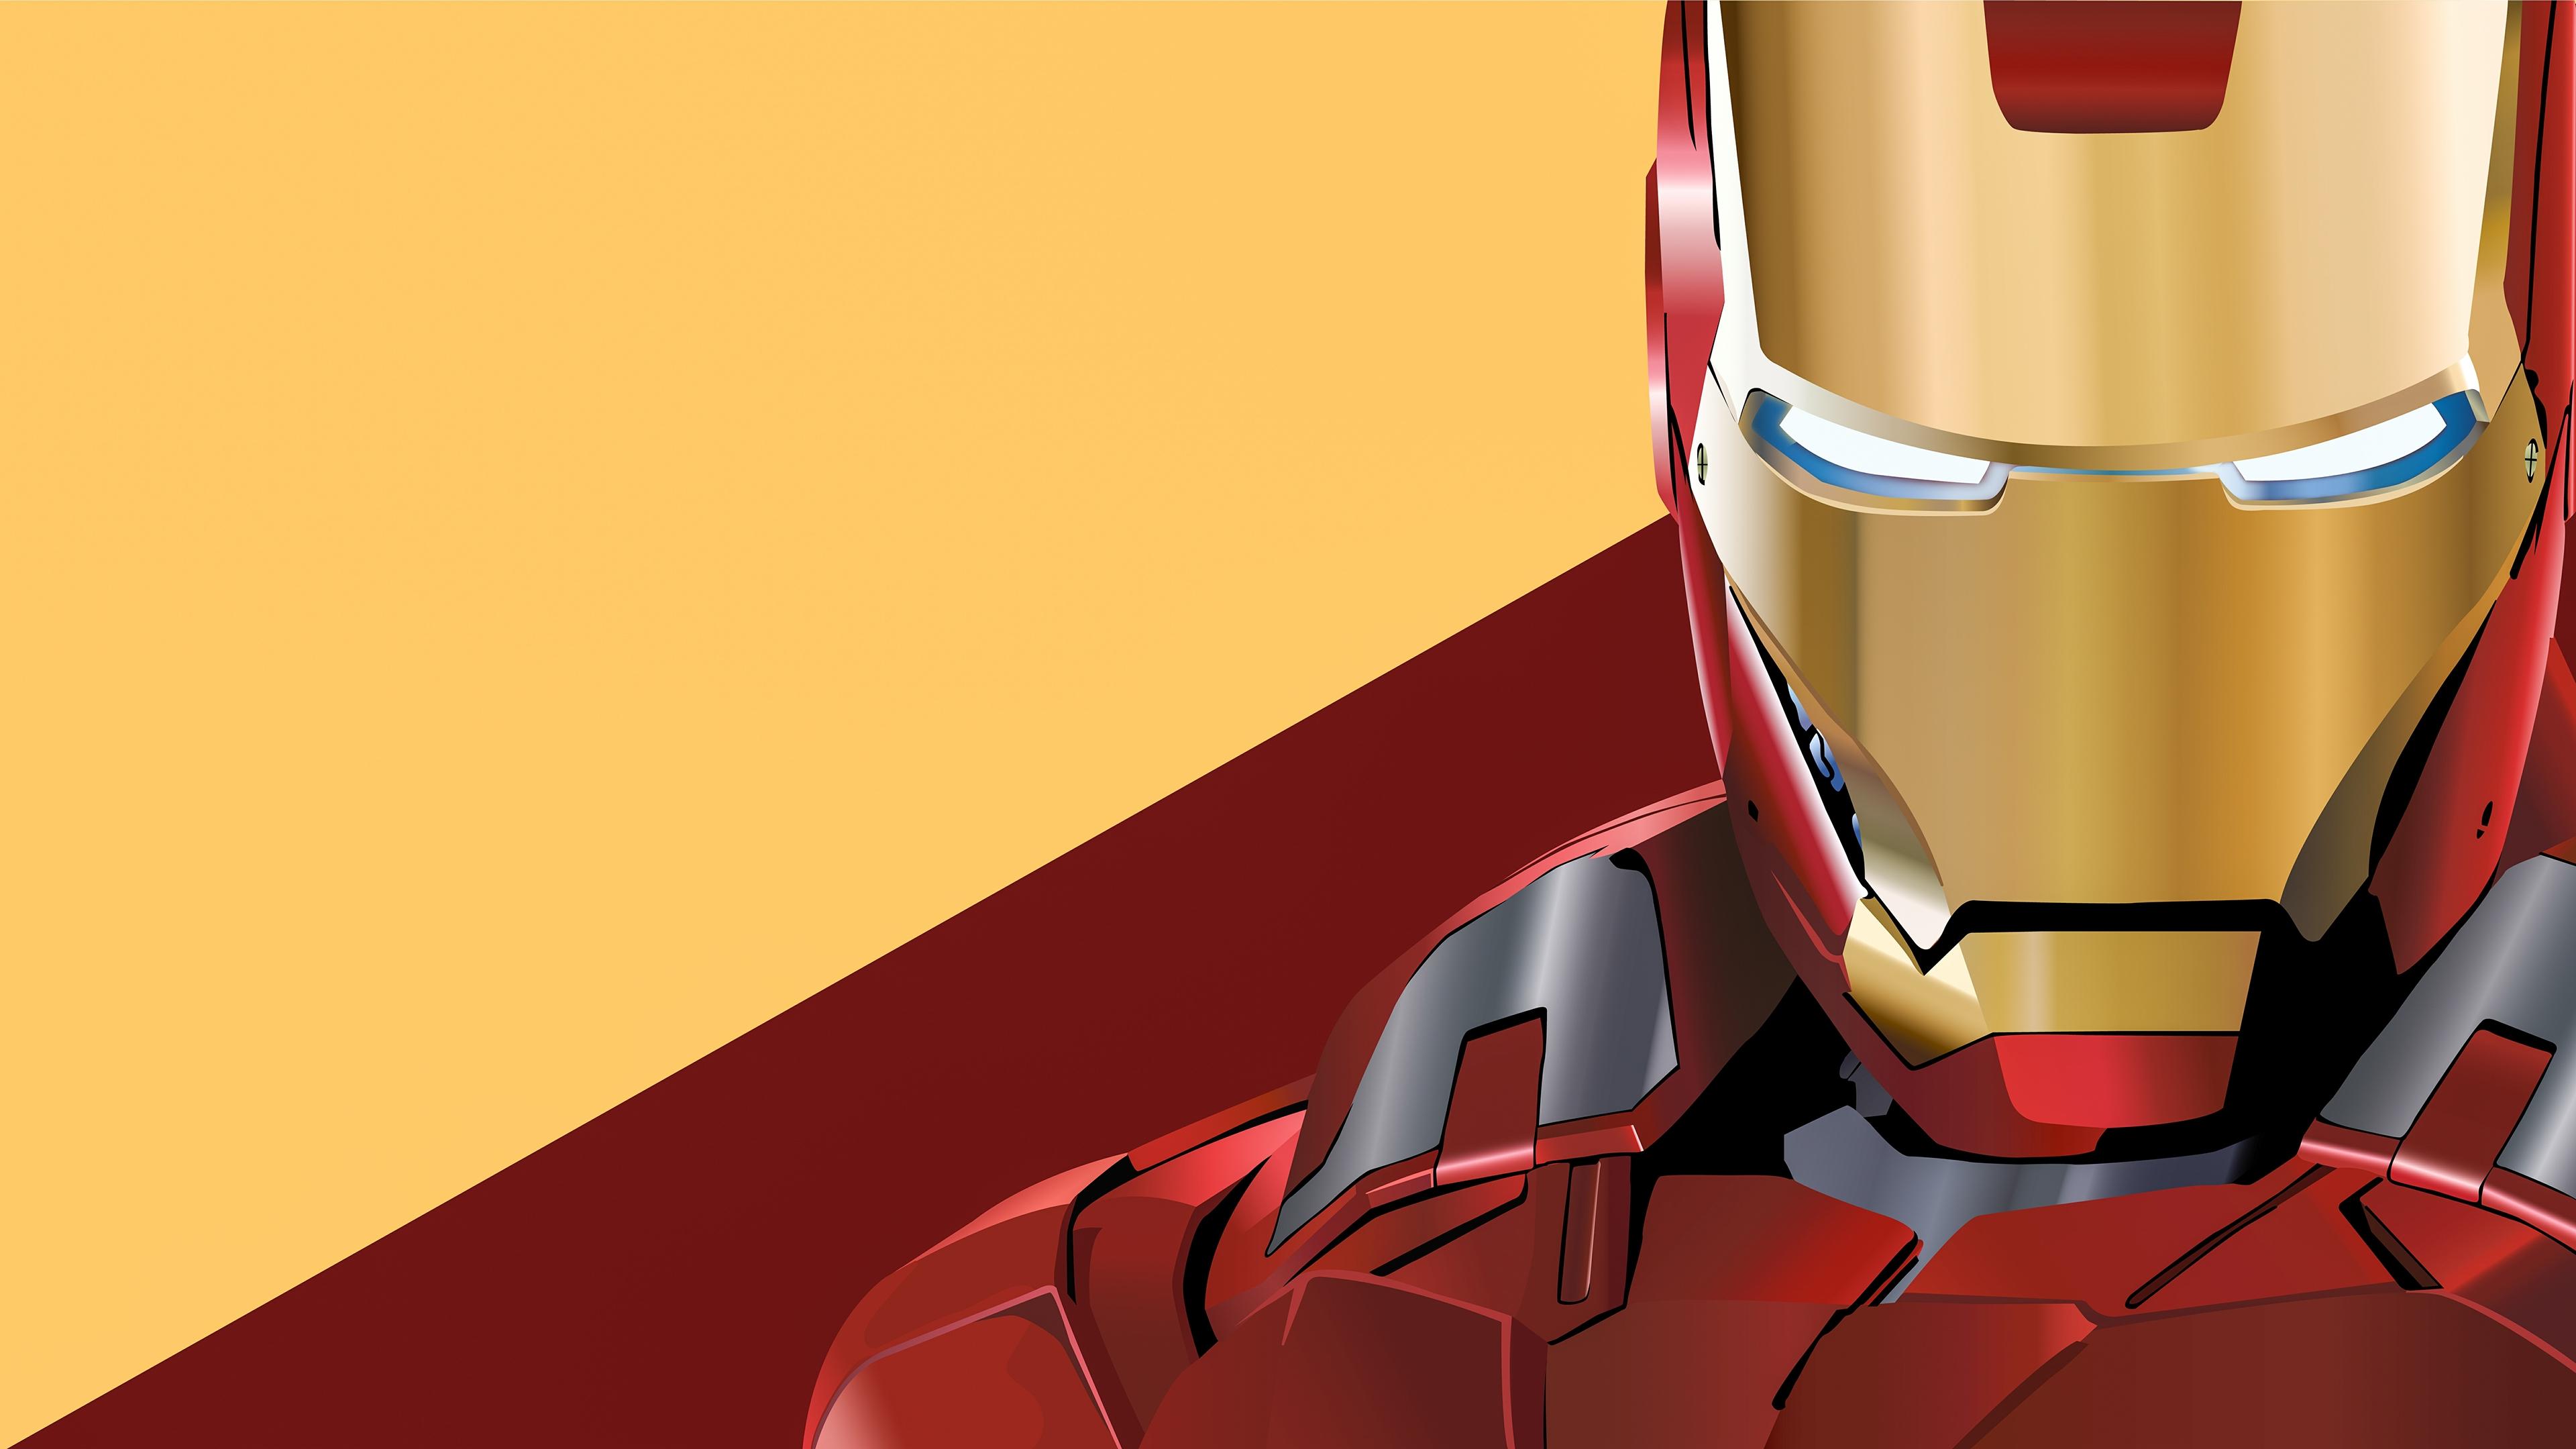 iron man digital artwork 4k 1538786566 - Iron Man Digital Artwork 4K - superheroes wallpapers, iron man wallpapers, hd-wallpapers, digital art wallpapers, behance wallpapers, artwork wallpapers, artist wallpapers, 4k-wallpapers